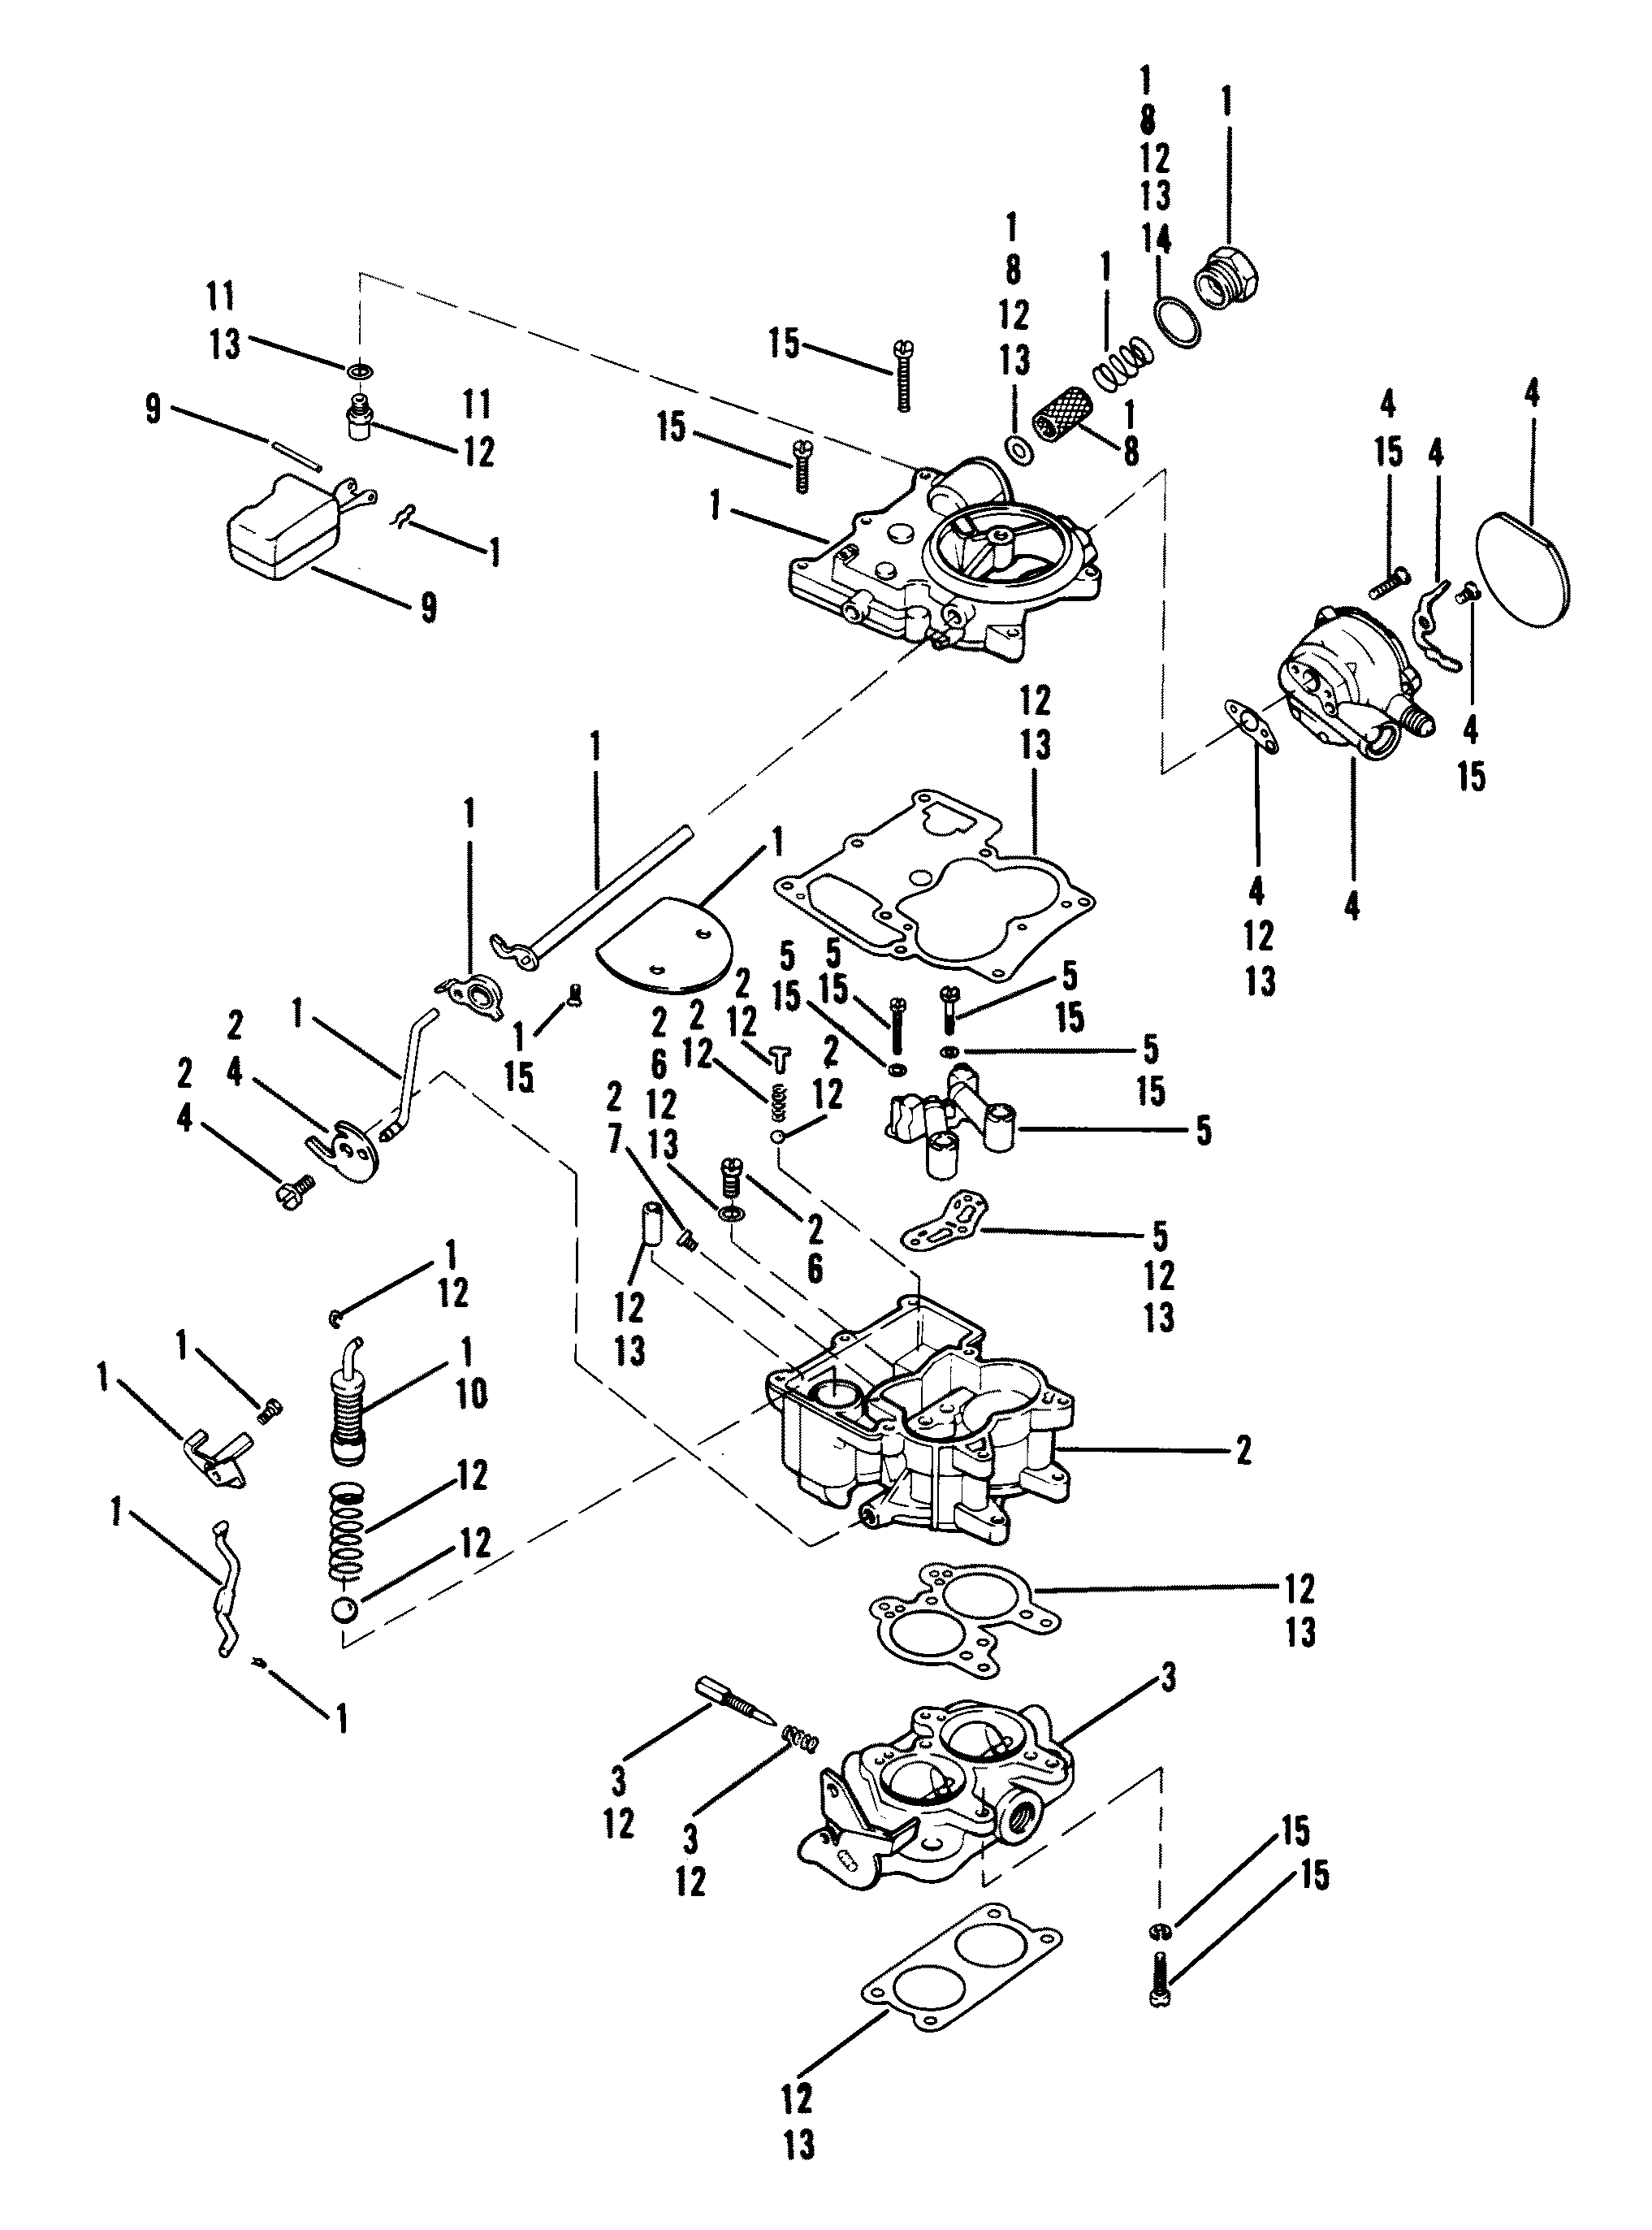 Mccormick Xtx 185 Wire Diagram | Wiring Diagram - Mercruiser 3.0 Wiring Diagram